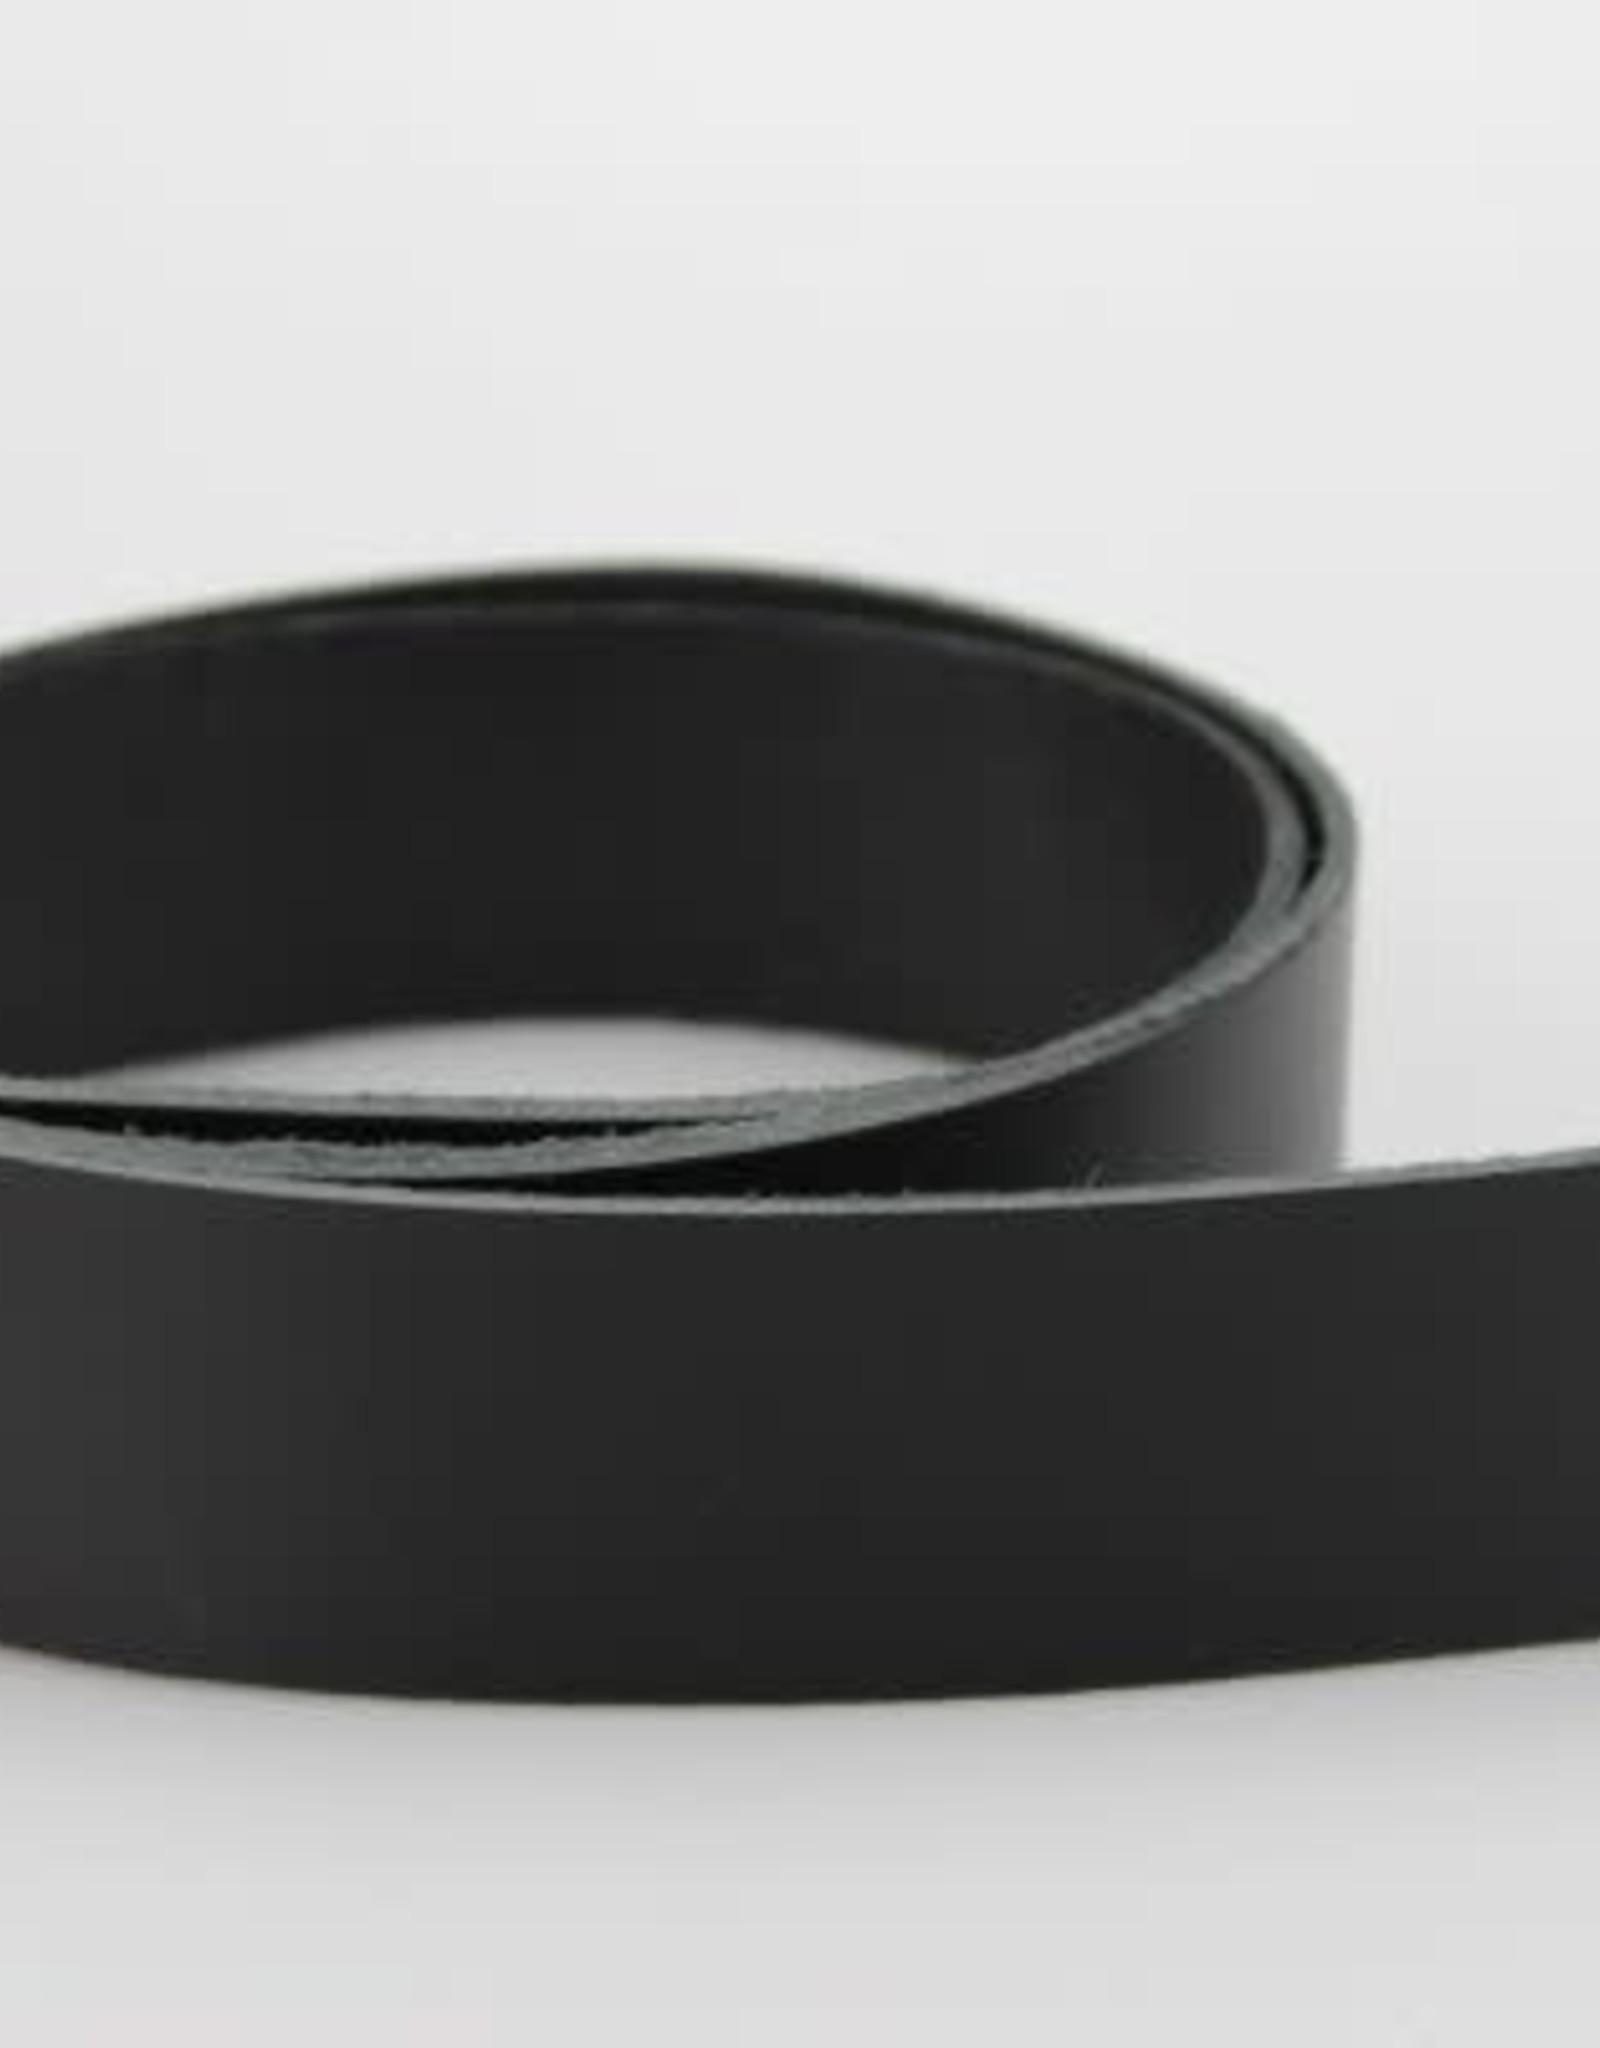 Lederen riem zwart 3cm x ca. 120 cm